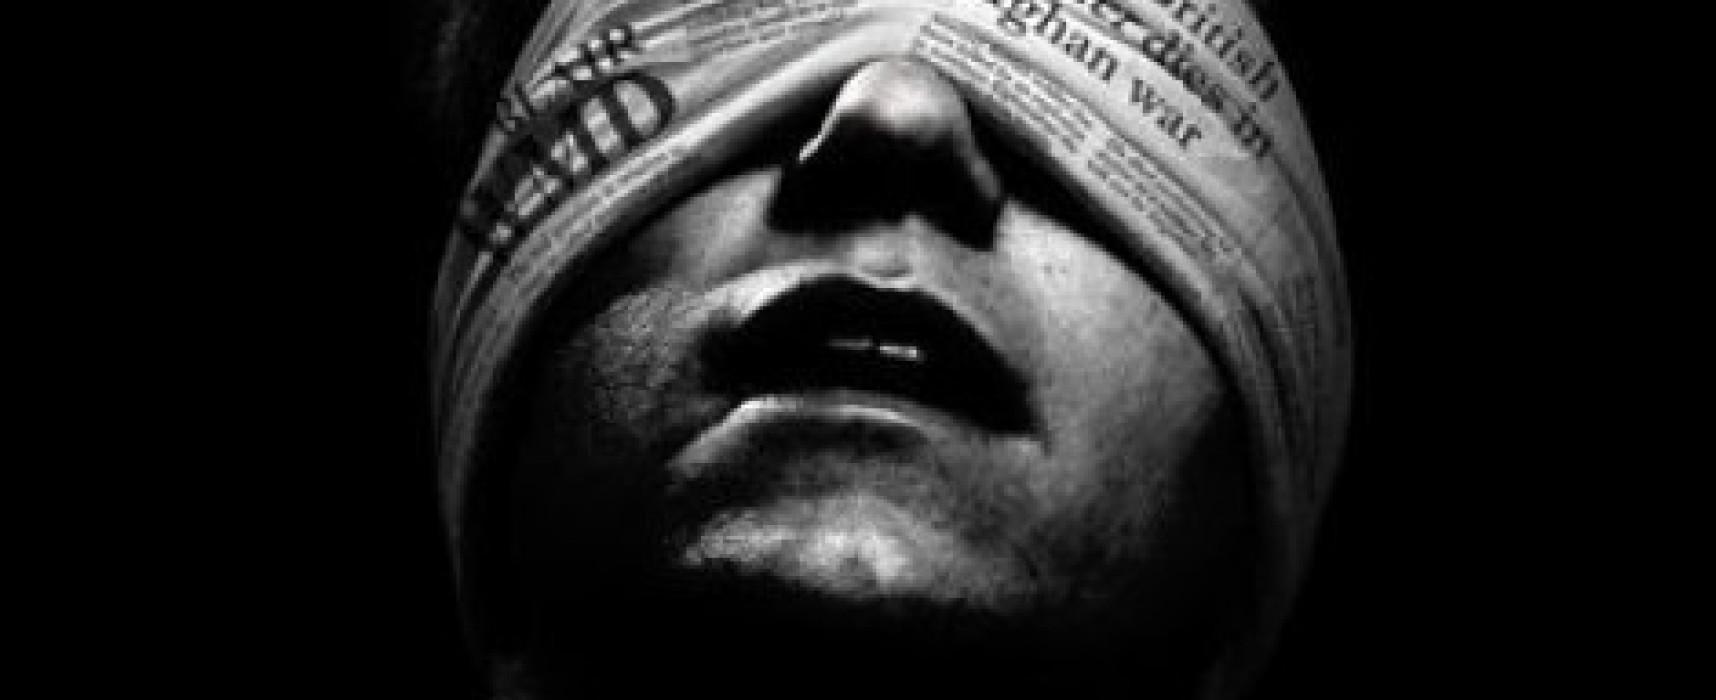 War by media and the triumph of propaganda